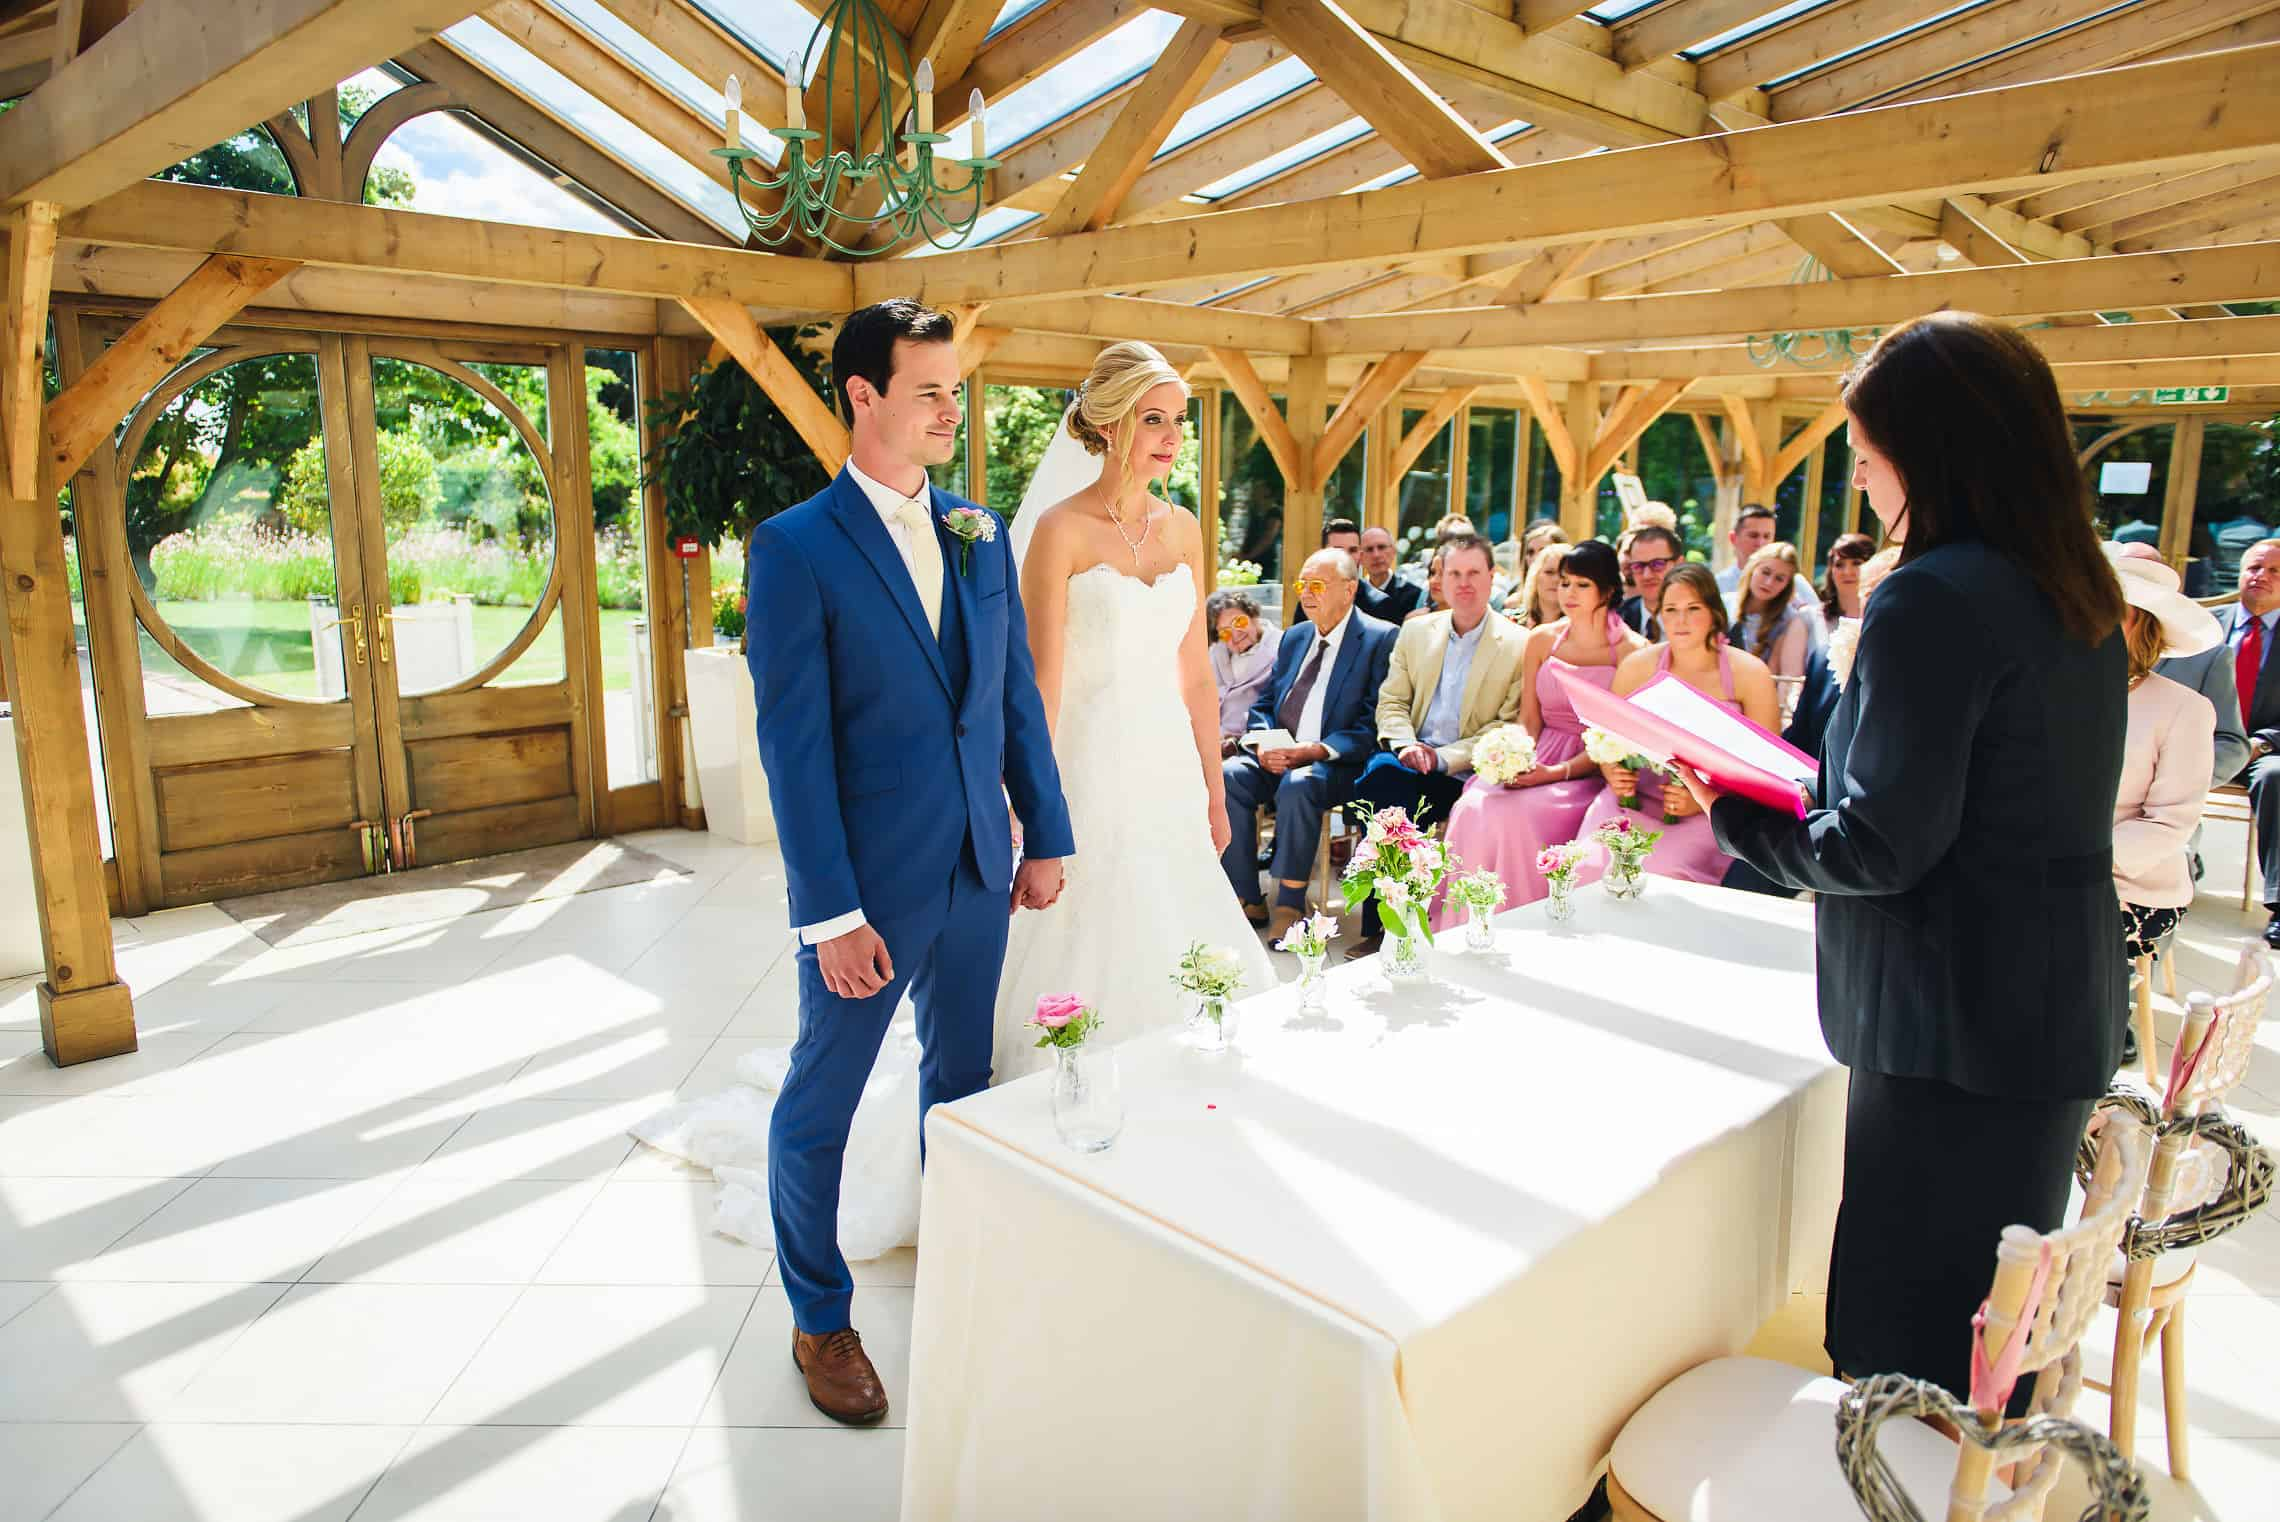 gaynes_park_wedding_lm_justin_bailey_photography_007